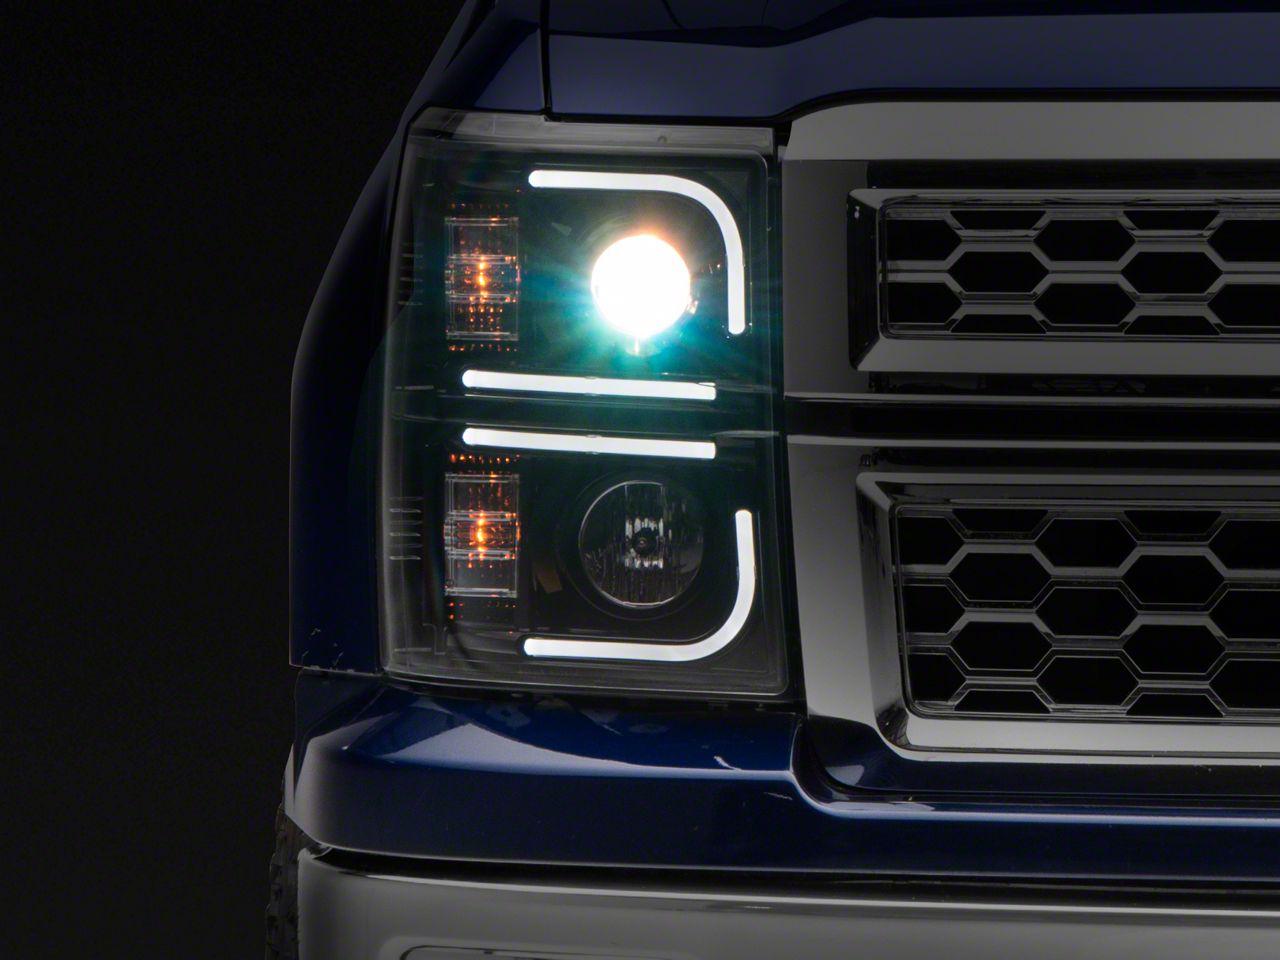 Recon Black Projector Headlights w/ OLED Halos & Daytime Running Lights - Smoked Lens (14-15 Silverado 1500)